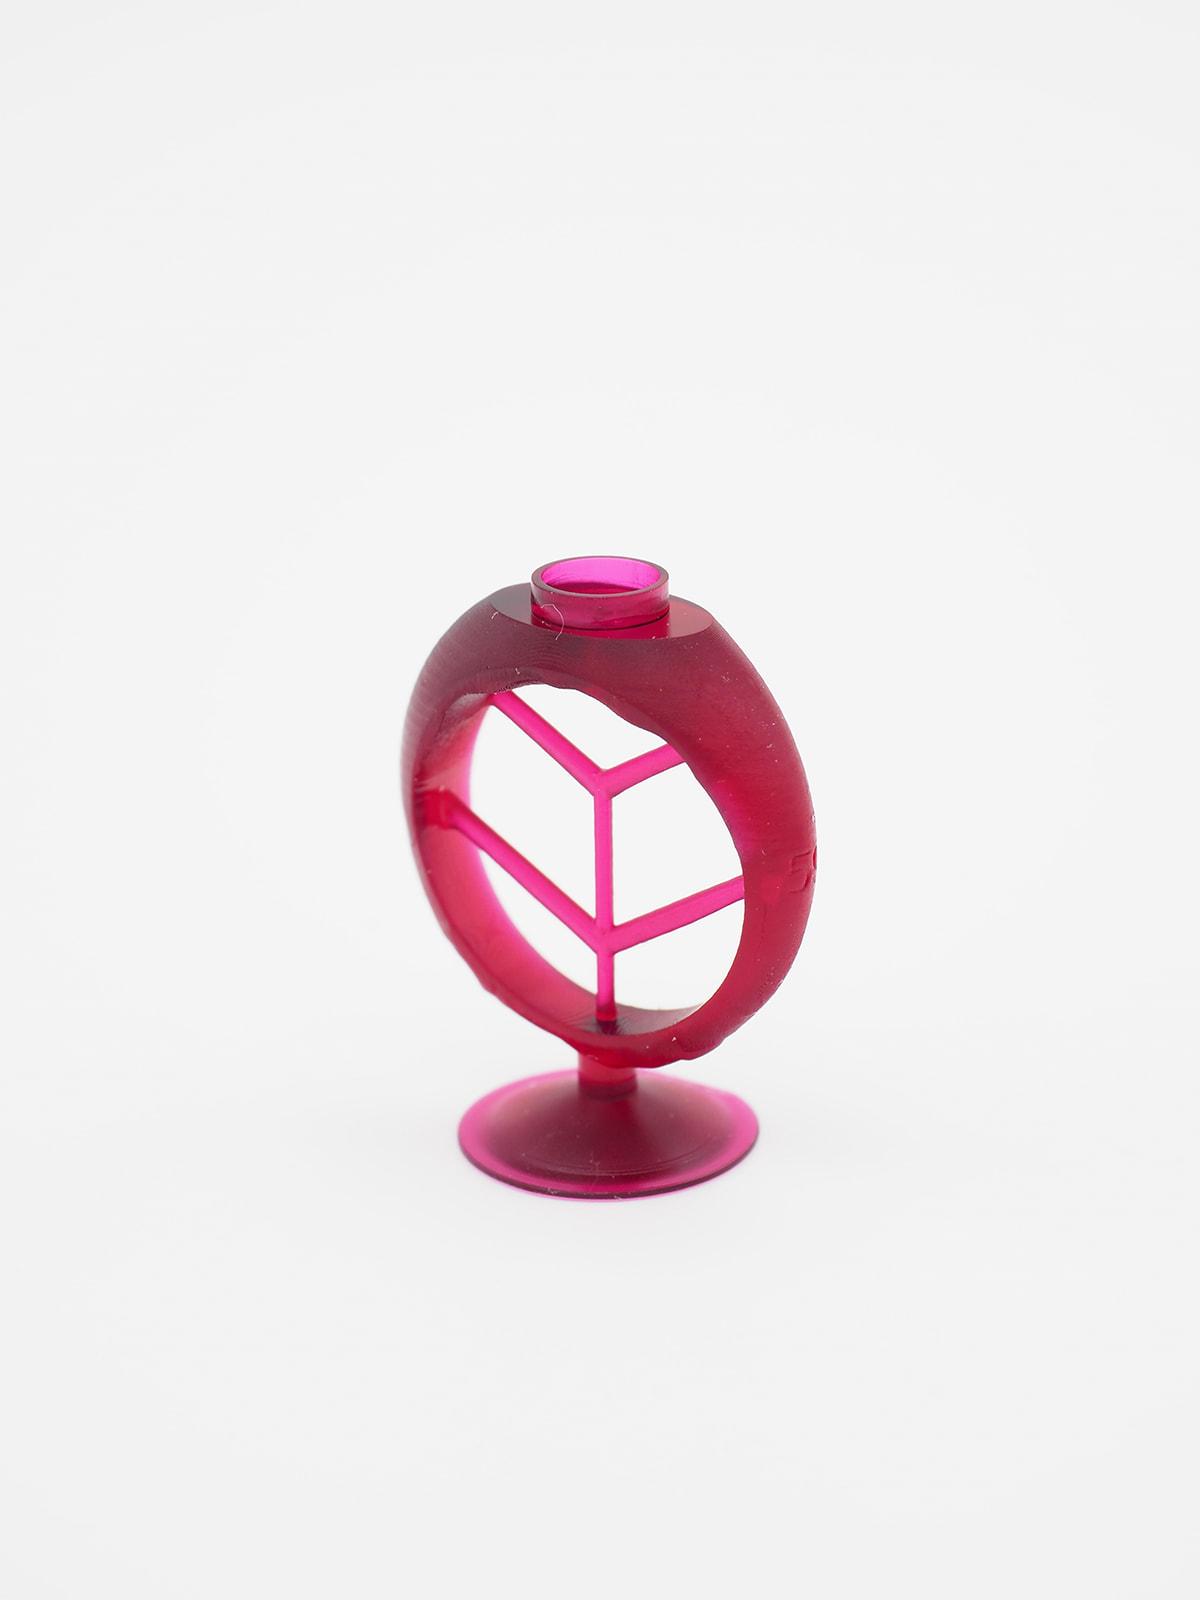 MACK4D - jewel cast